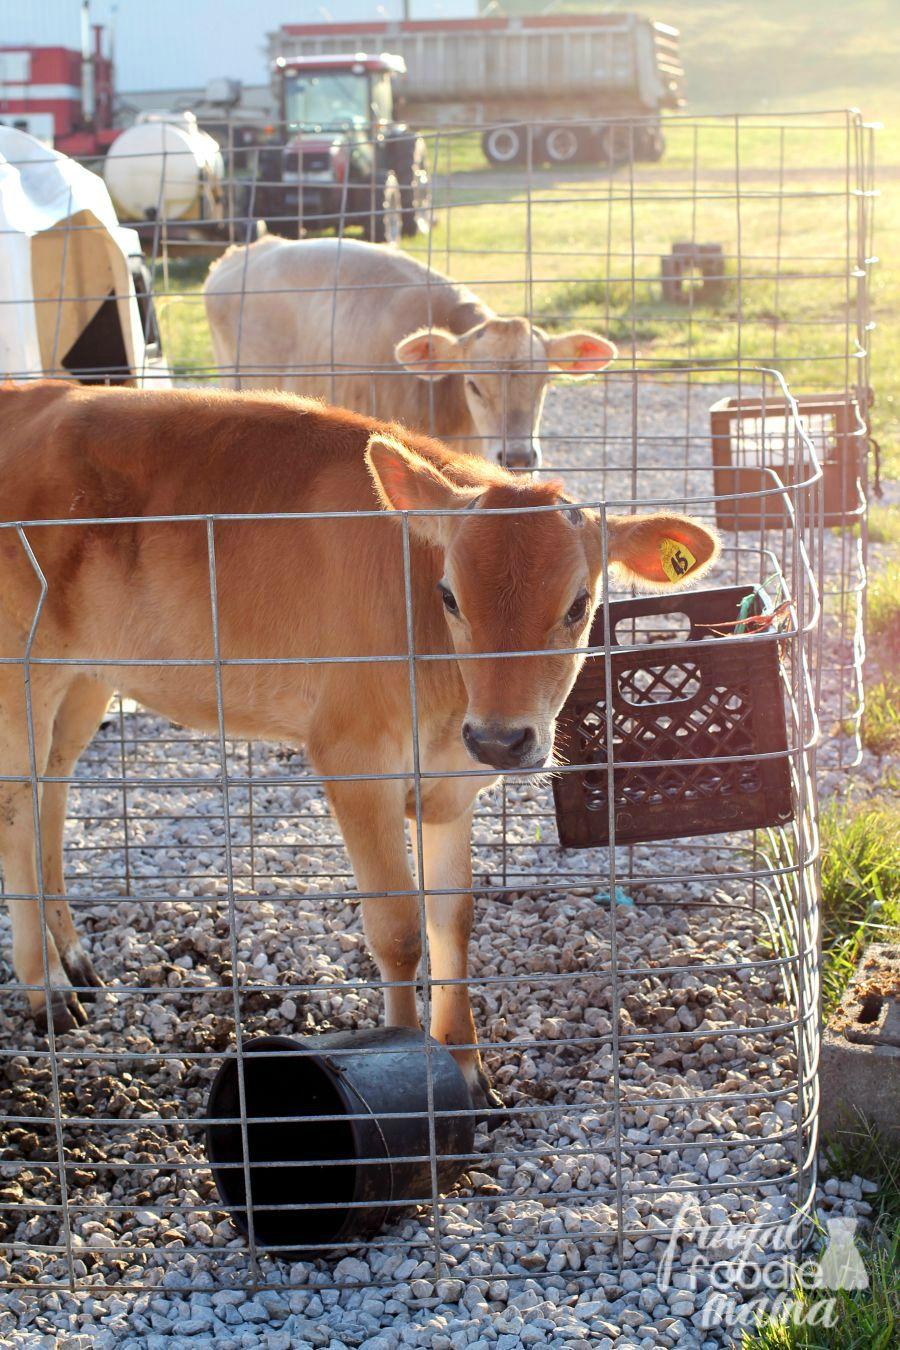 Frugal Foodie Mama My Ohio Dairy Adventure